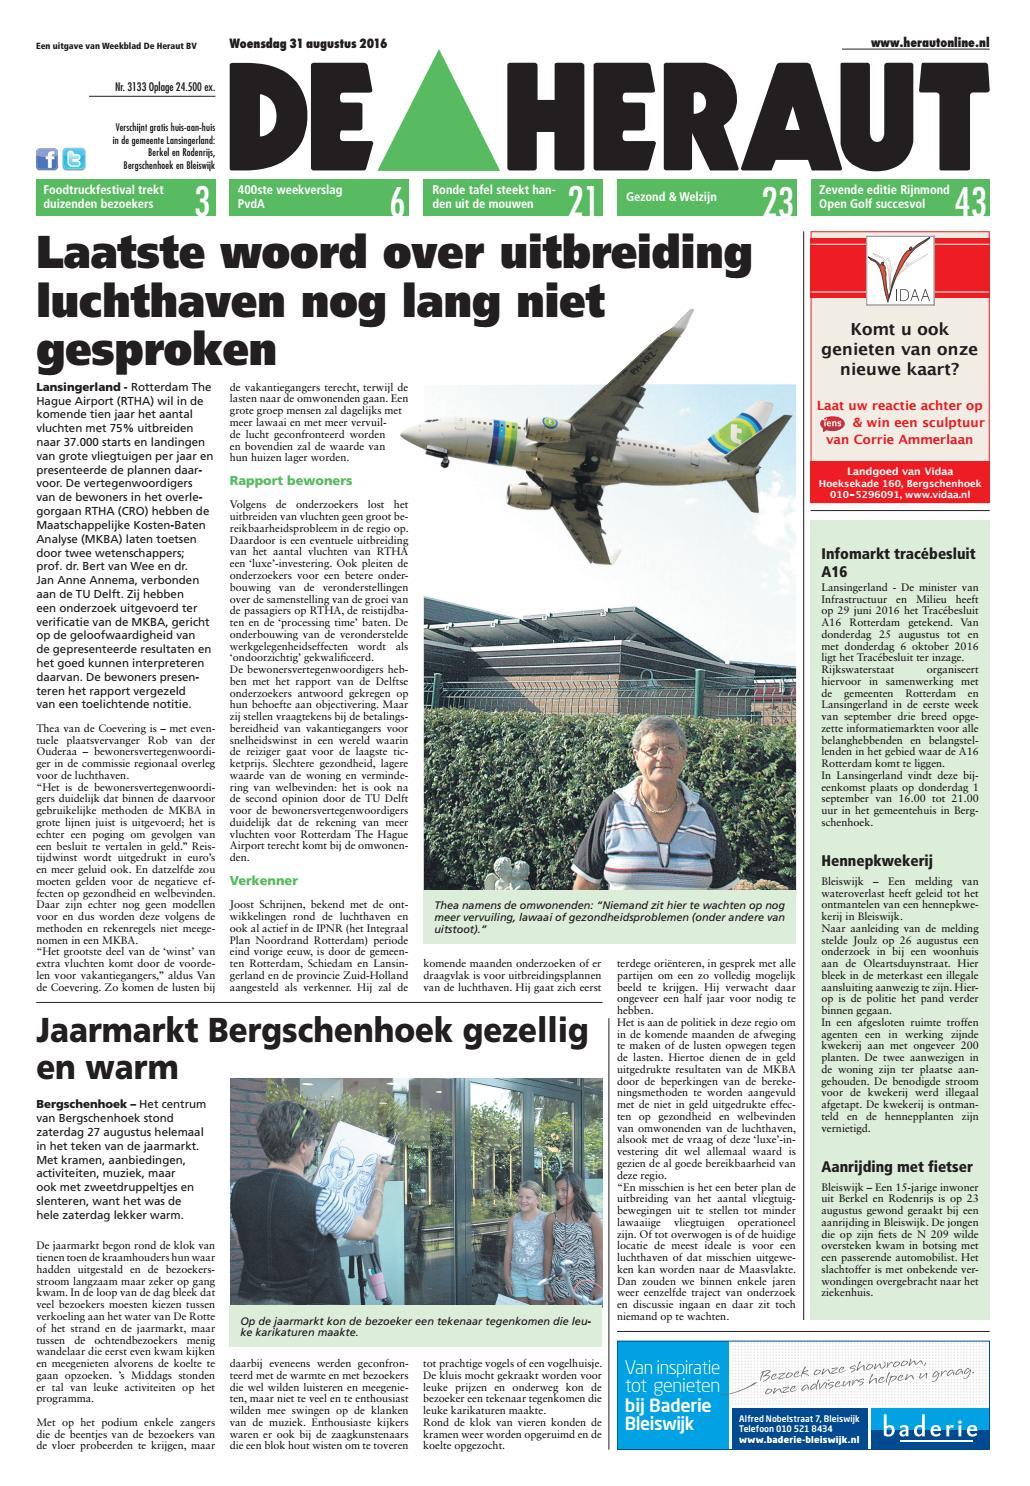 Heraut Week 15 2017 By Nieuwsblad De Issuu Comport Carpet Karpet Mercy B200 Premium 2cm 35 2016